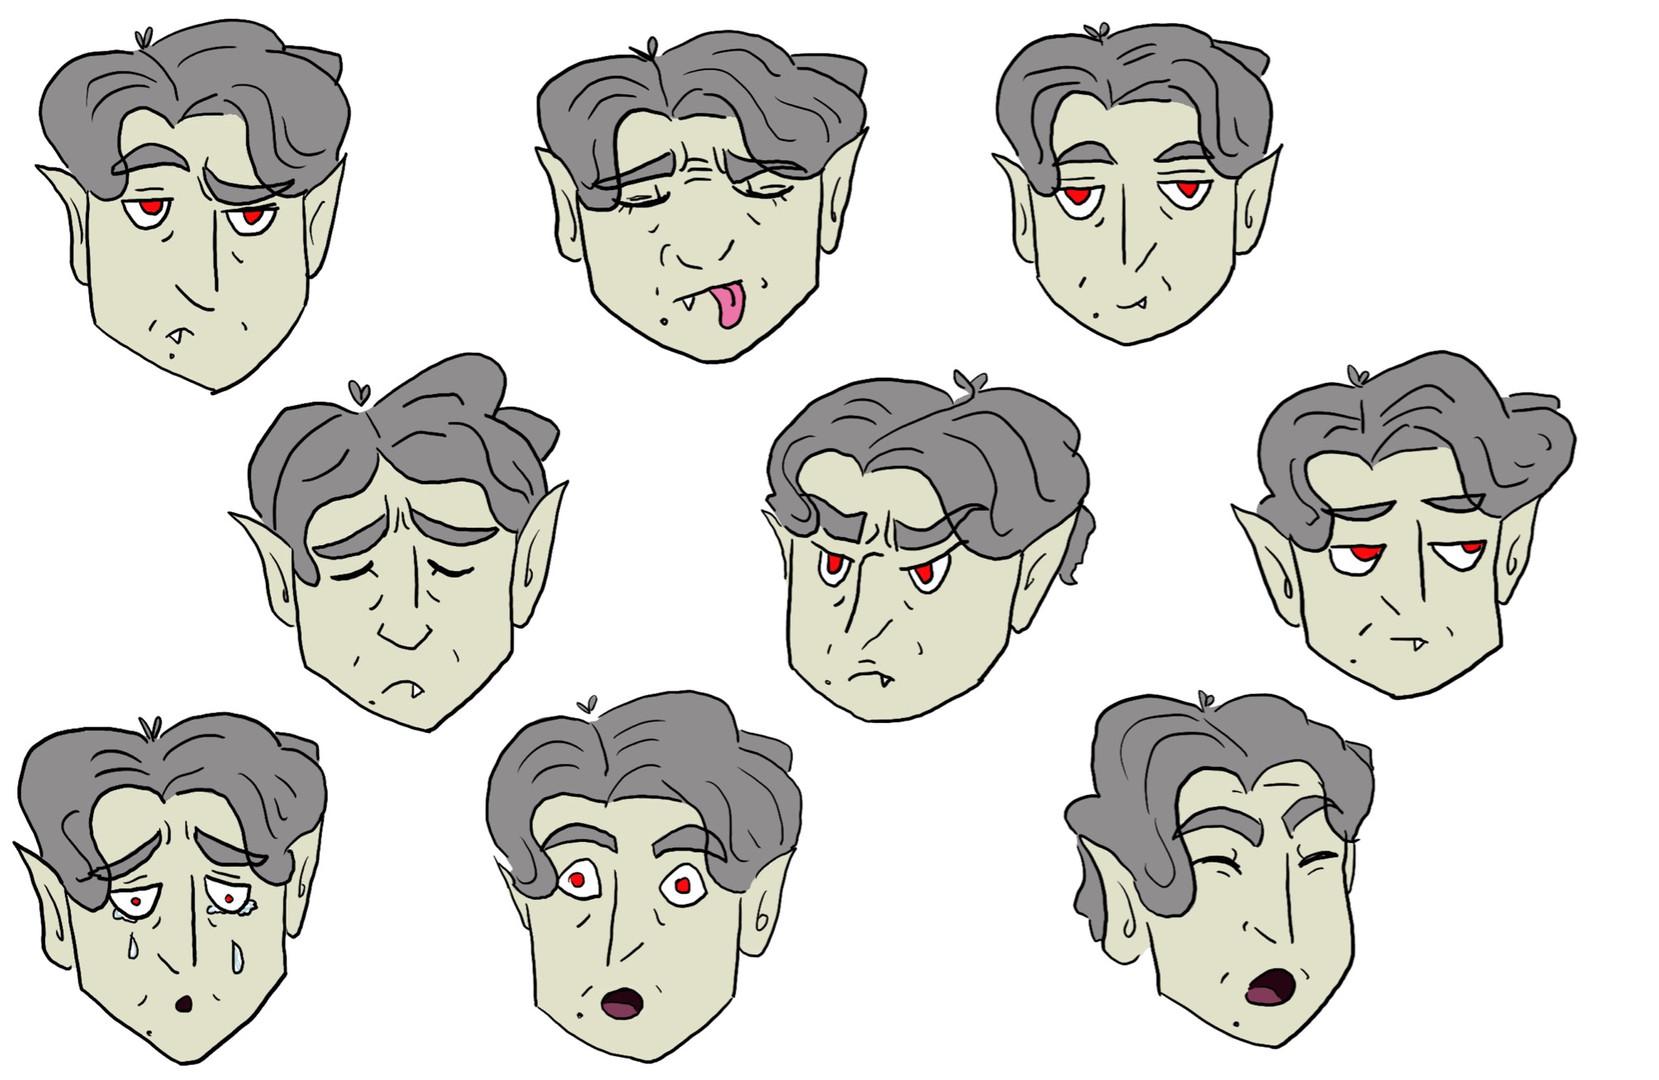 Batthew - Expression sheet